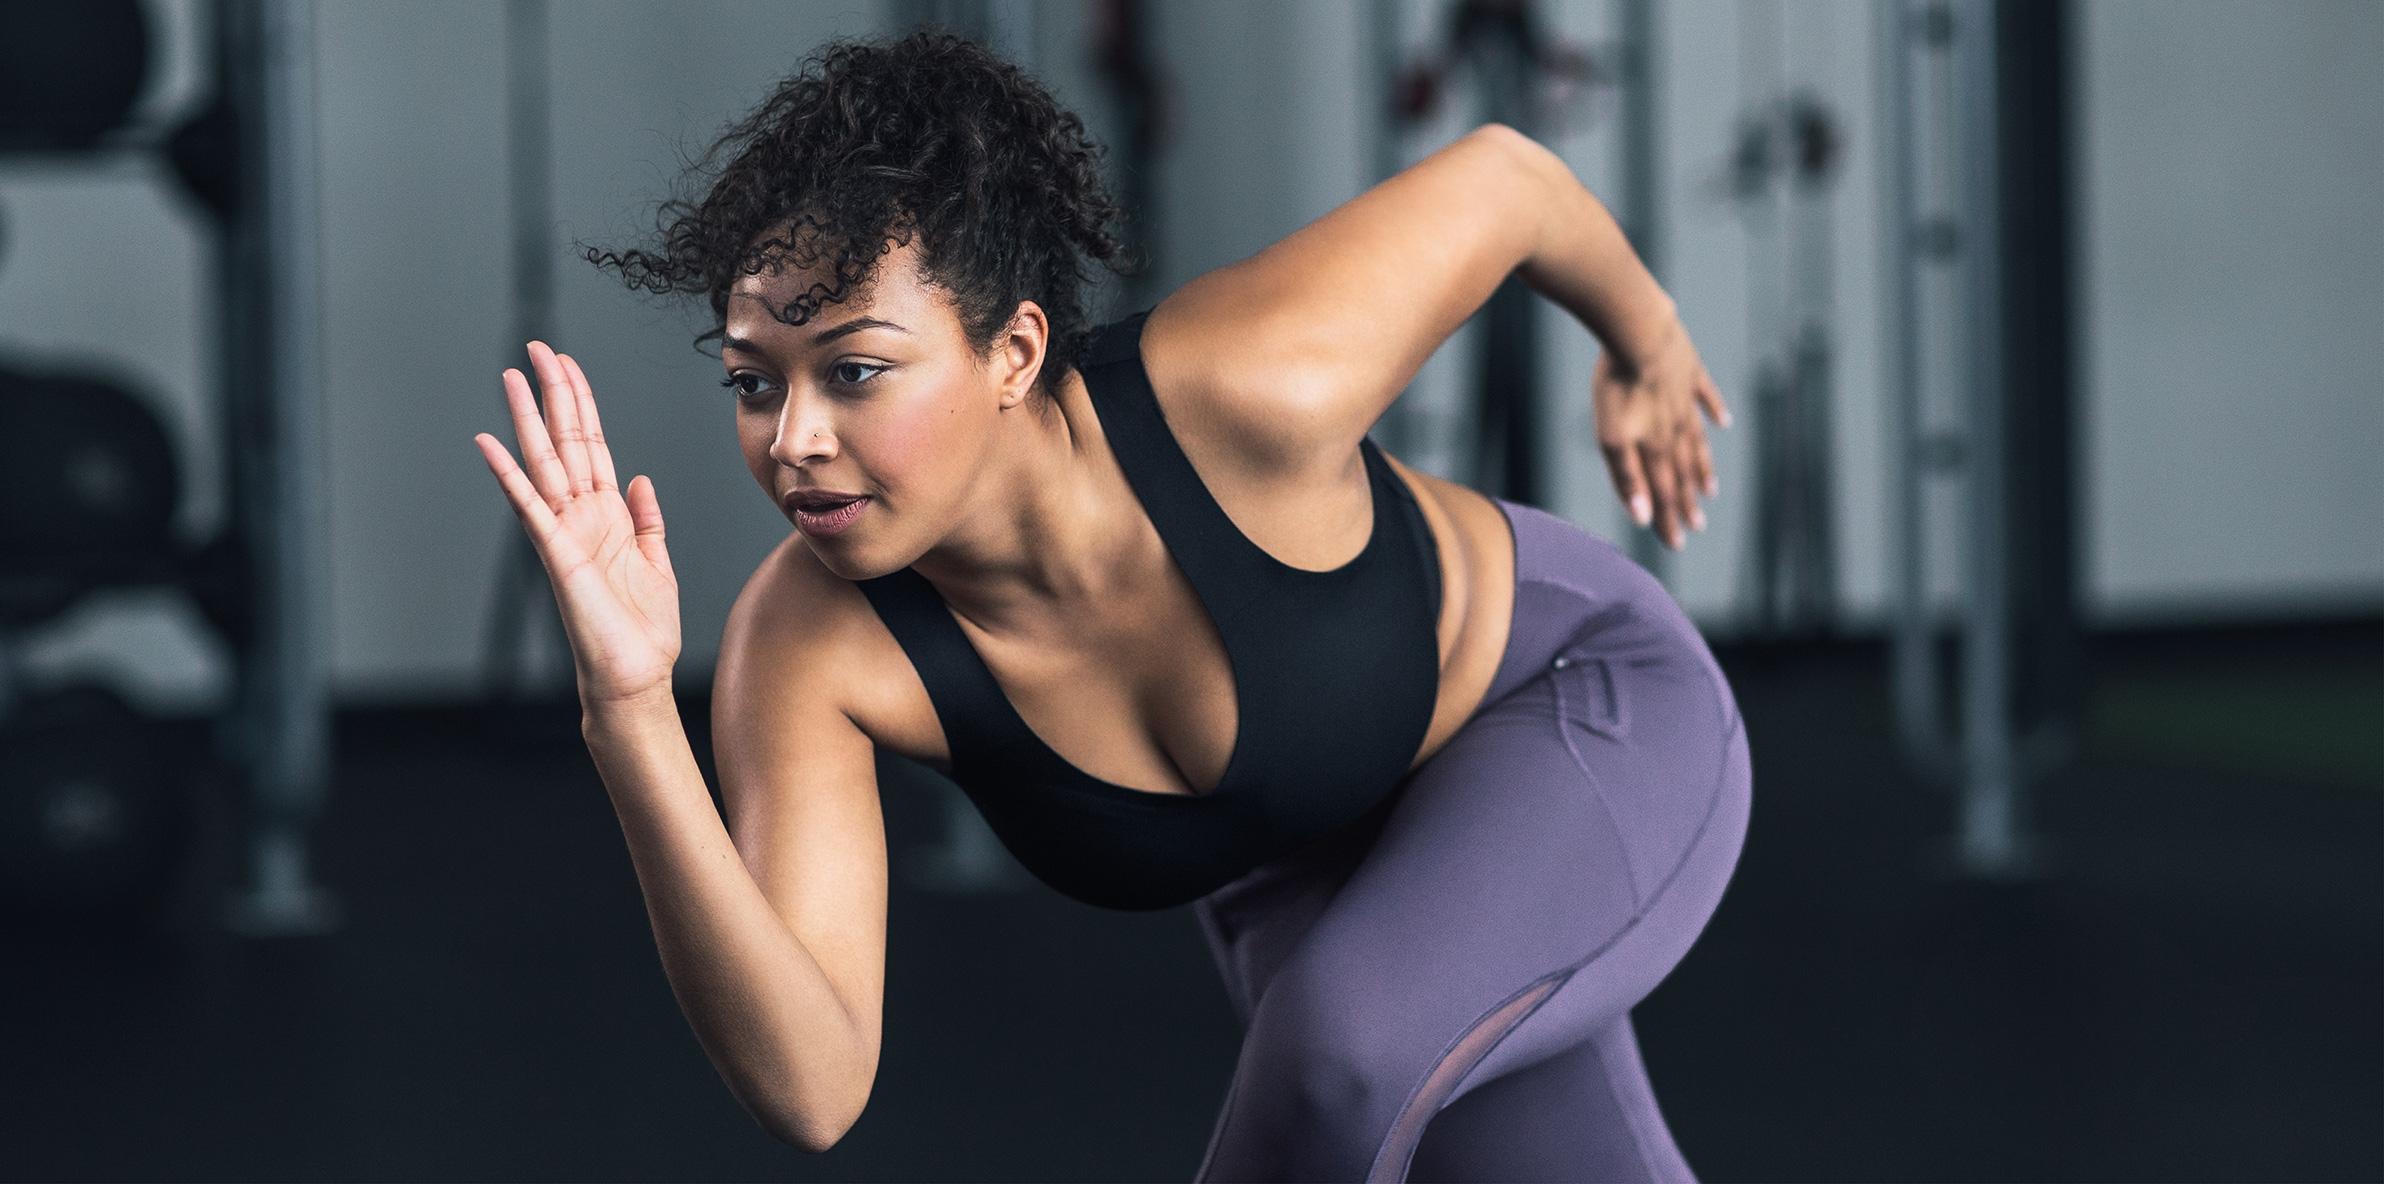 A model wearing a black Lululemon sports bra and purple workout leggings